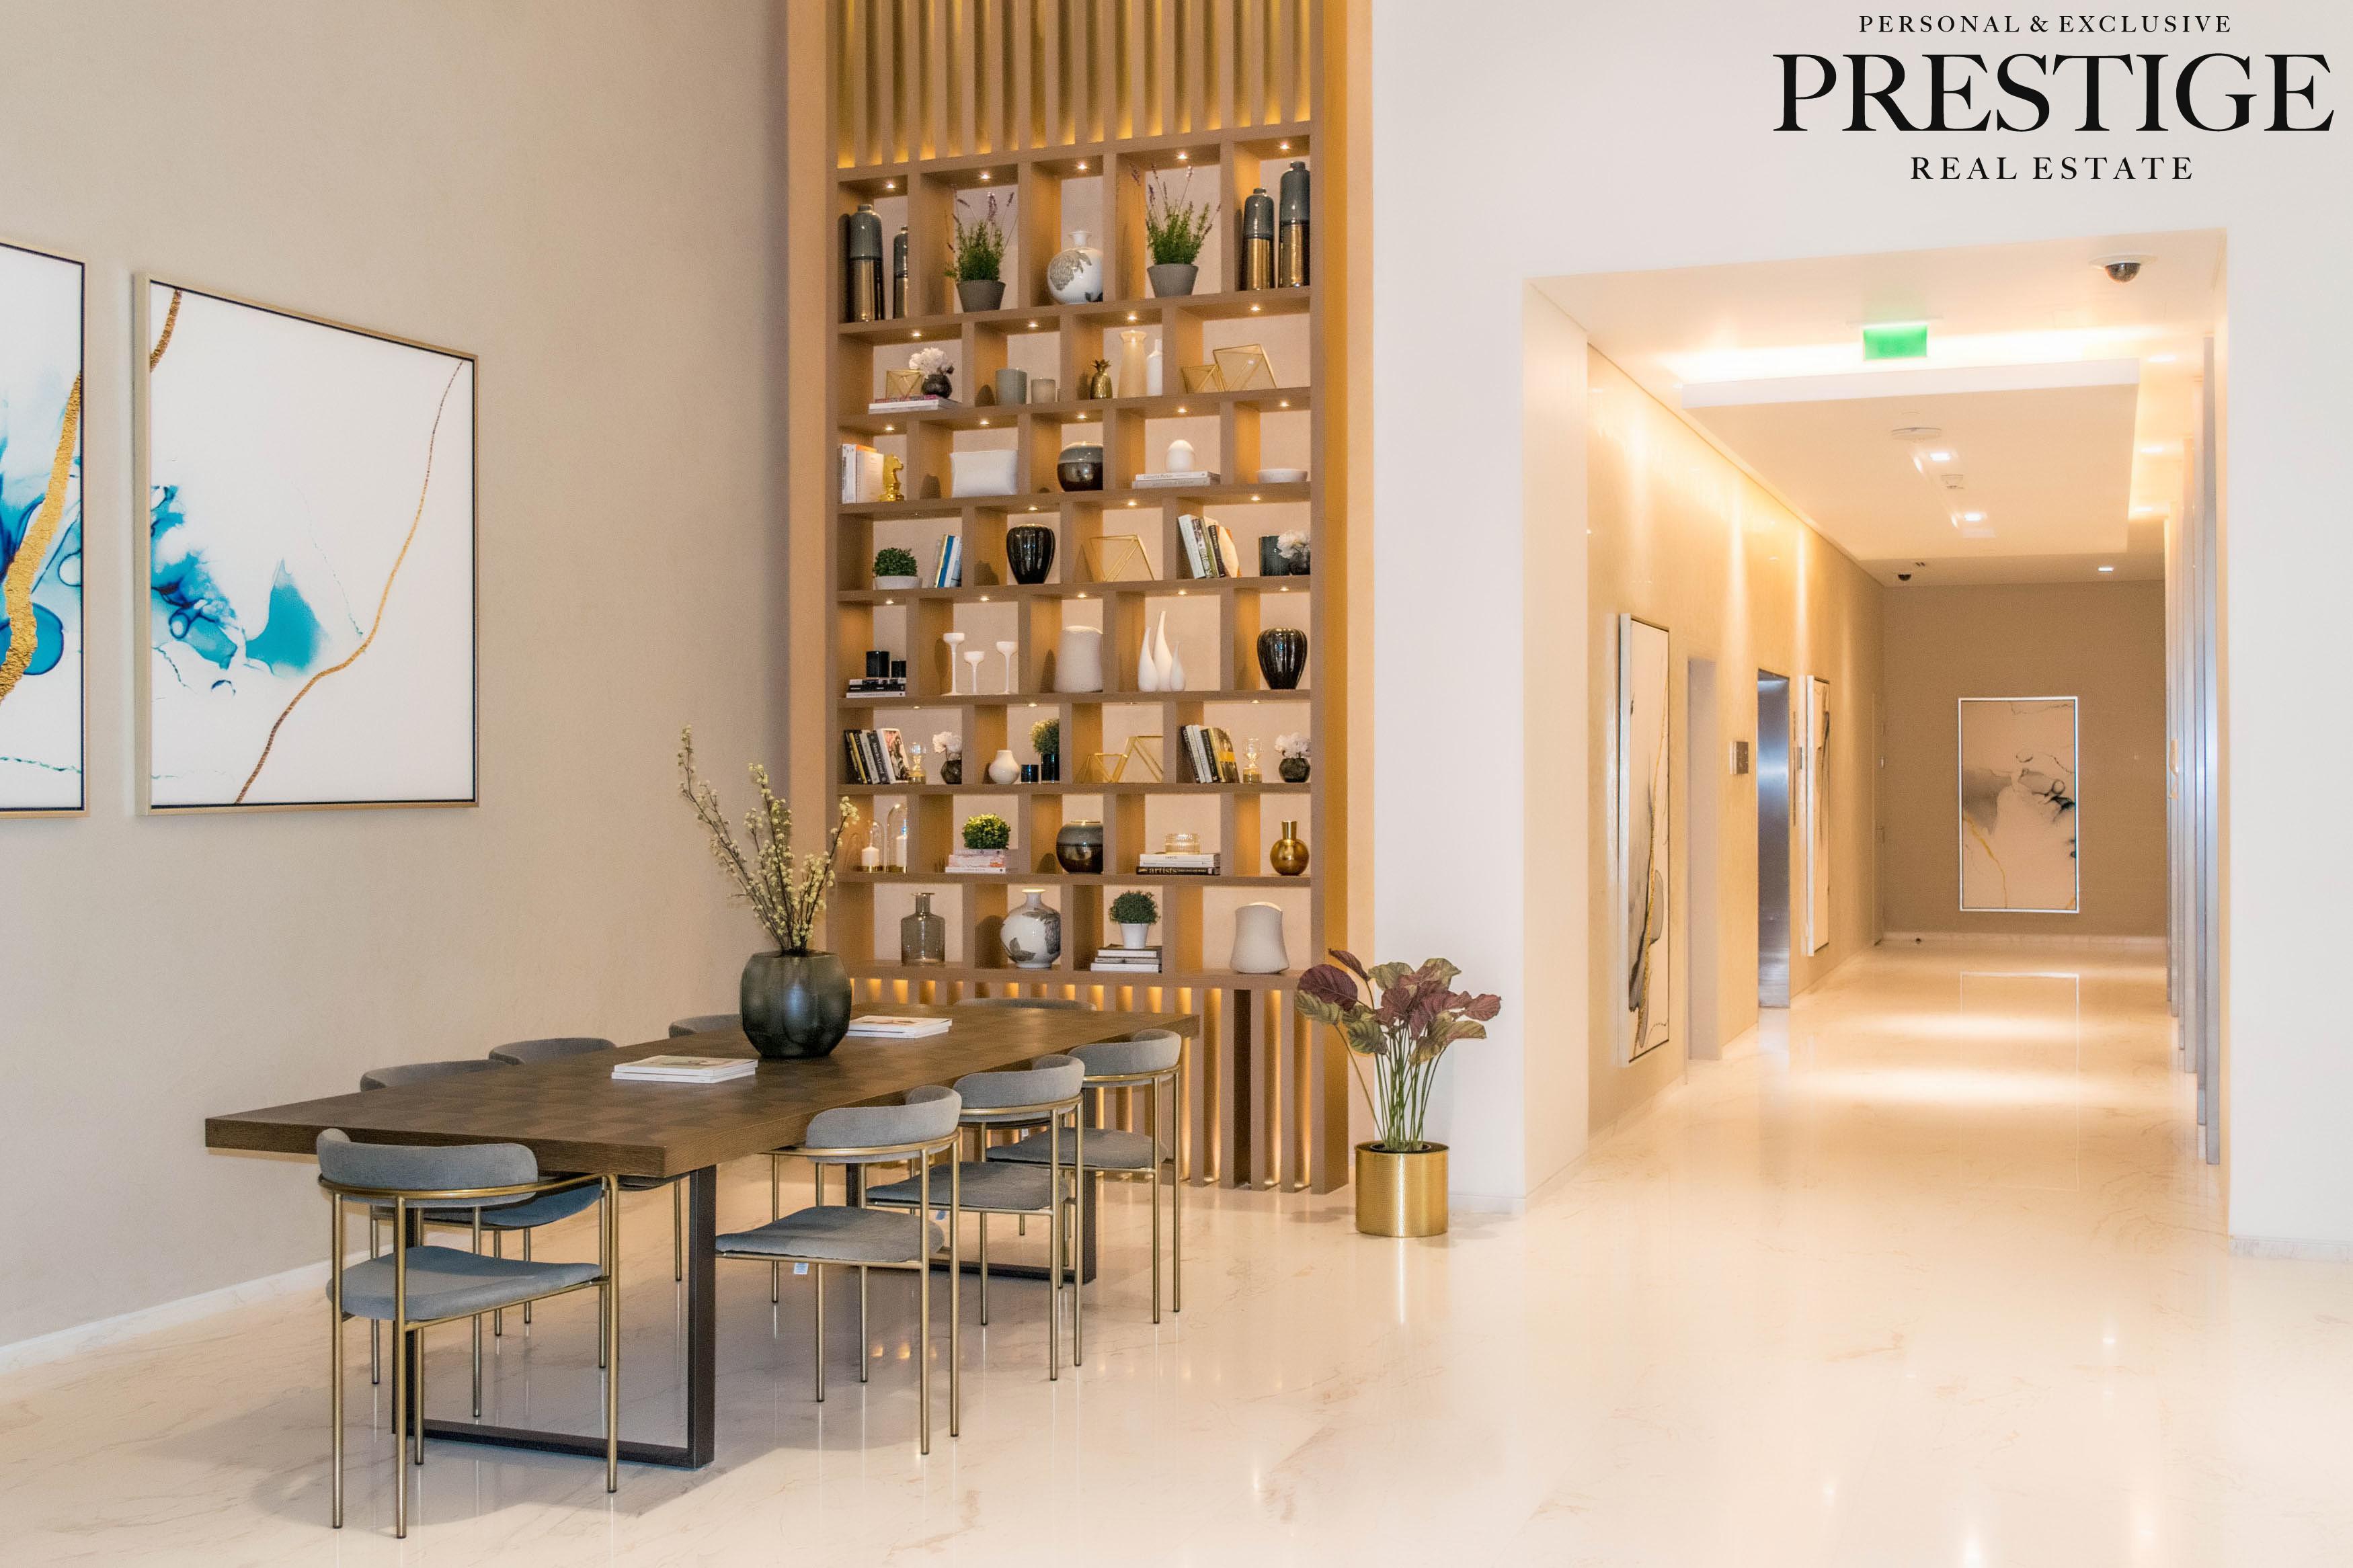 1-bedroom-chiller-free-burj-view-brand-new